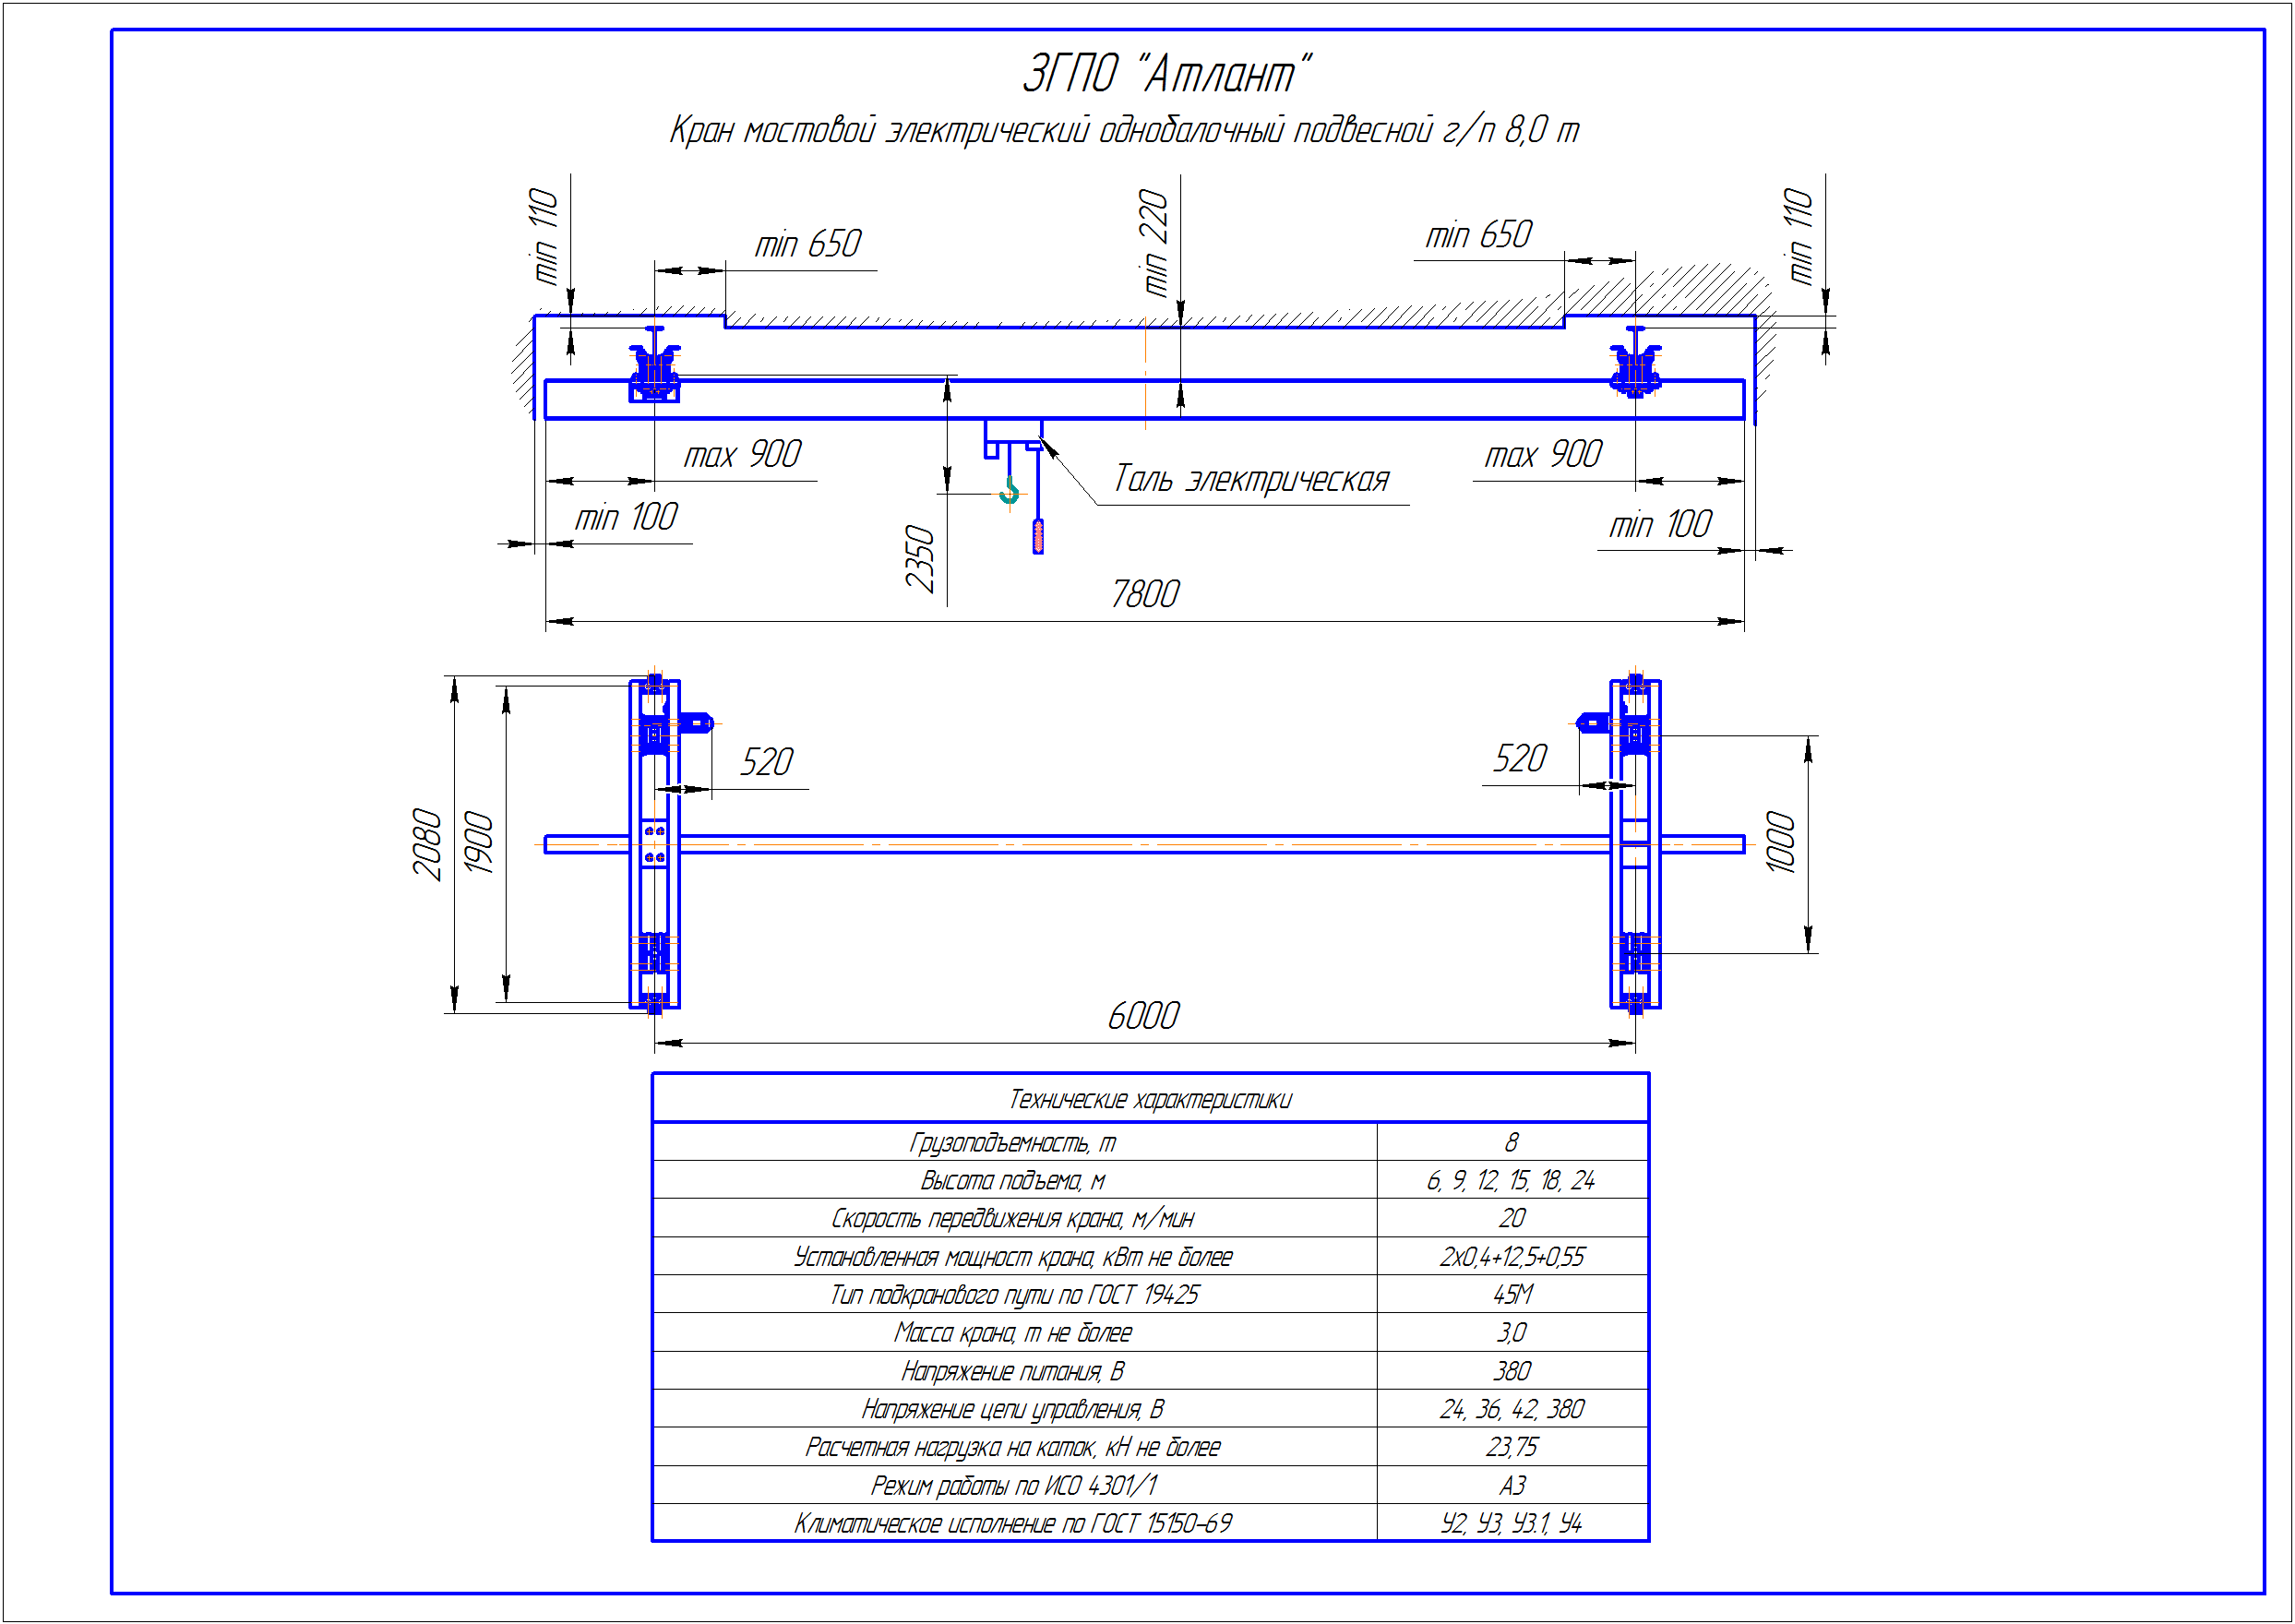 KBP 6 2 - Подвесная кран балка